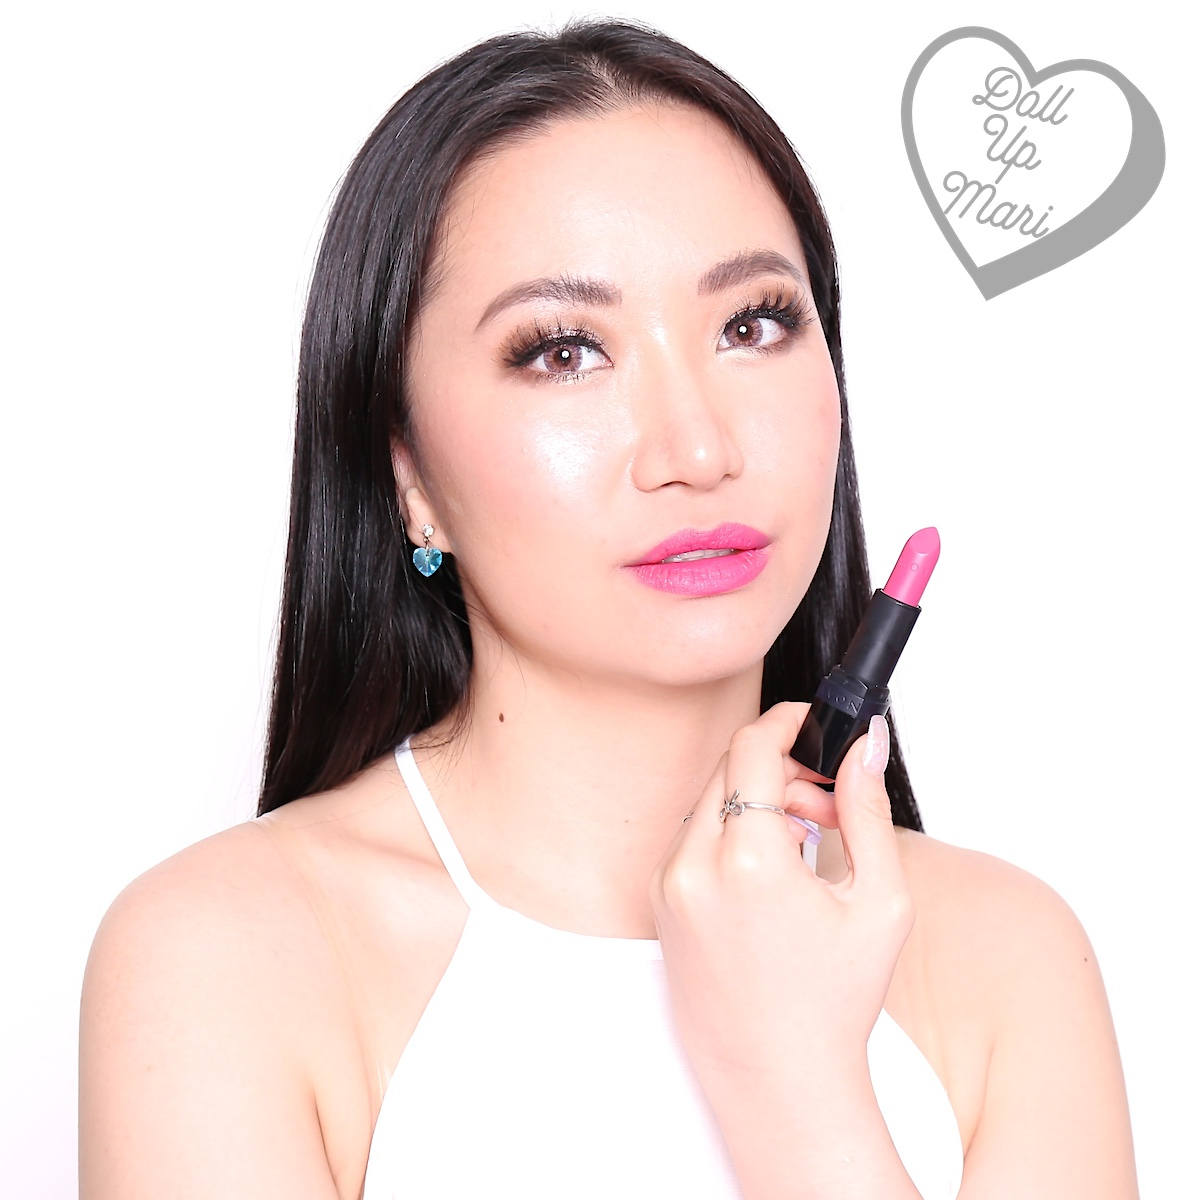 Wearing Adoring Love shade of AVON Perfectly Matte Lipstick